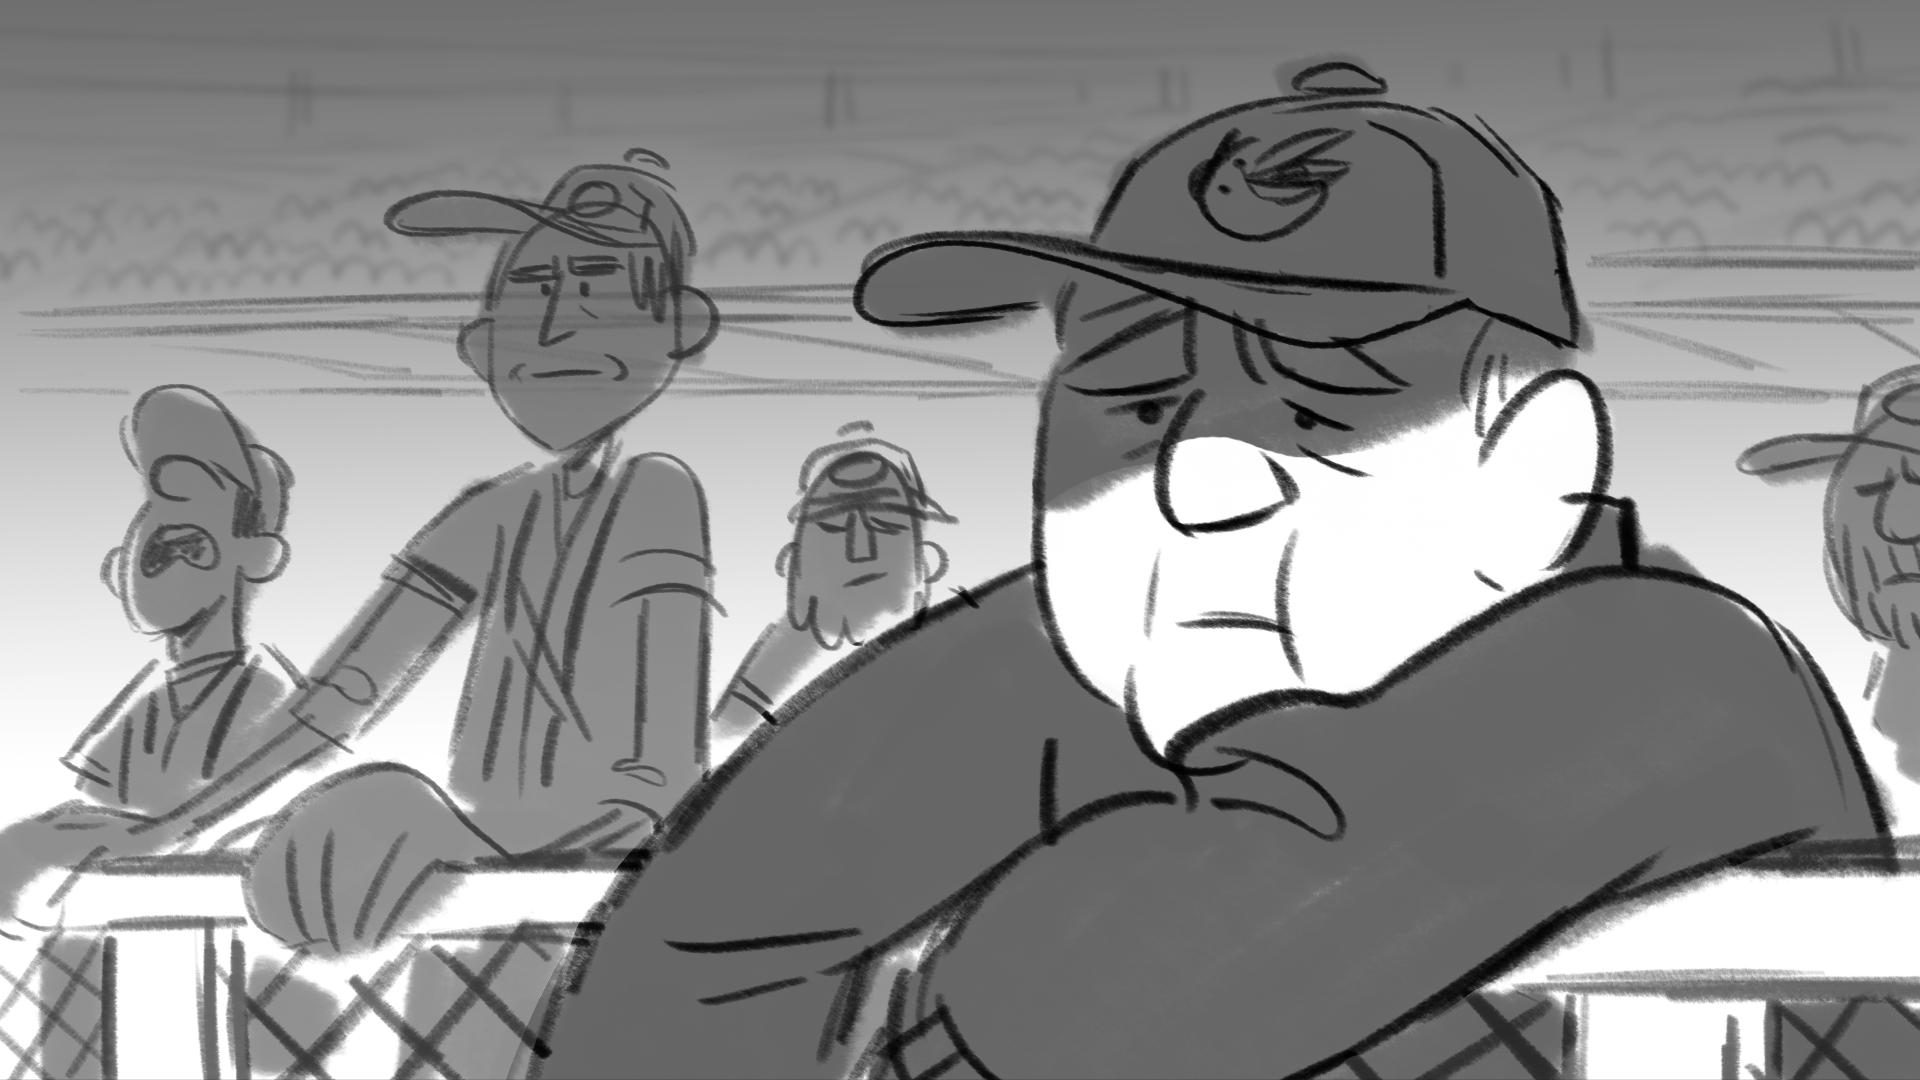 baseballBoards_A__0030_Layer-Comp-31.png